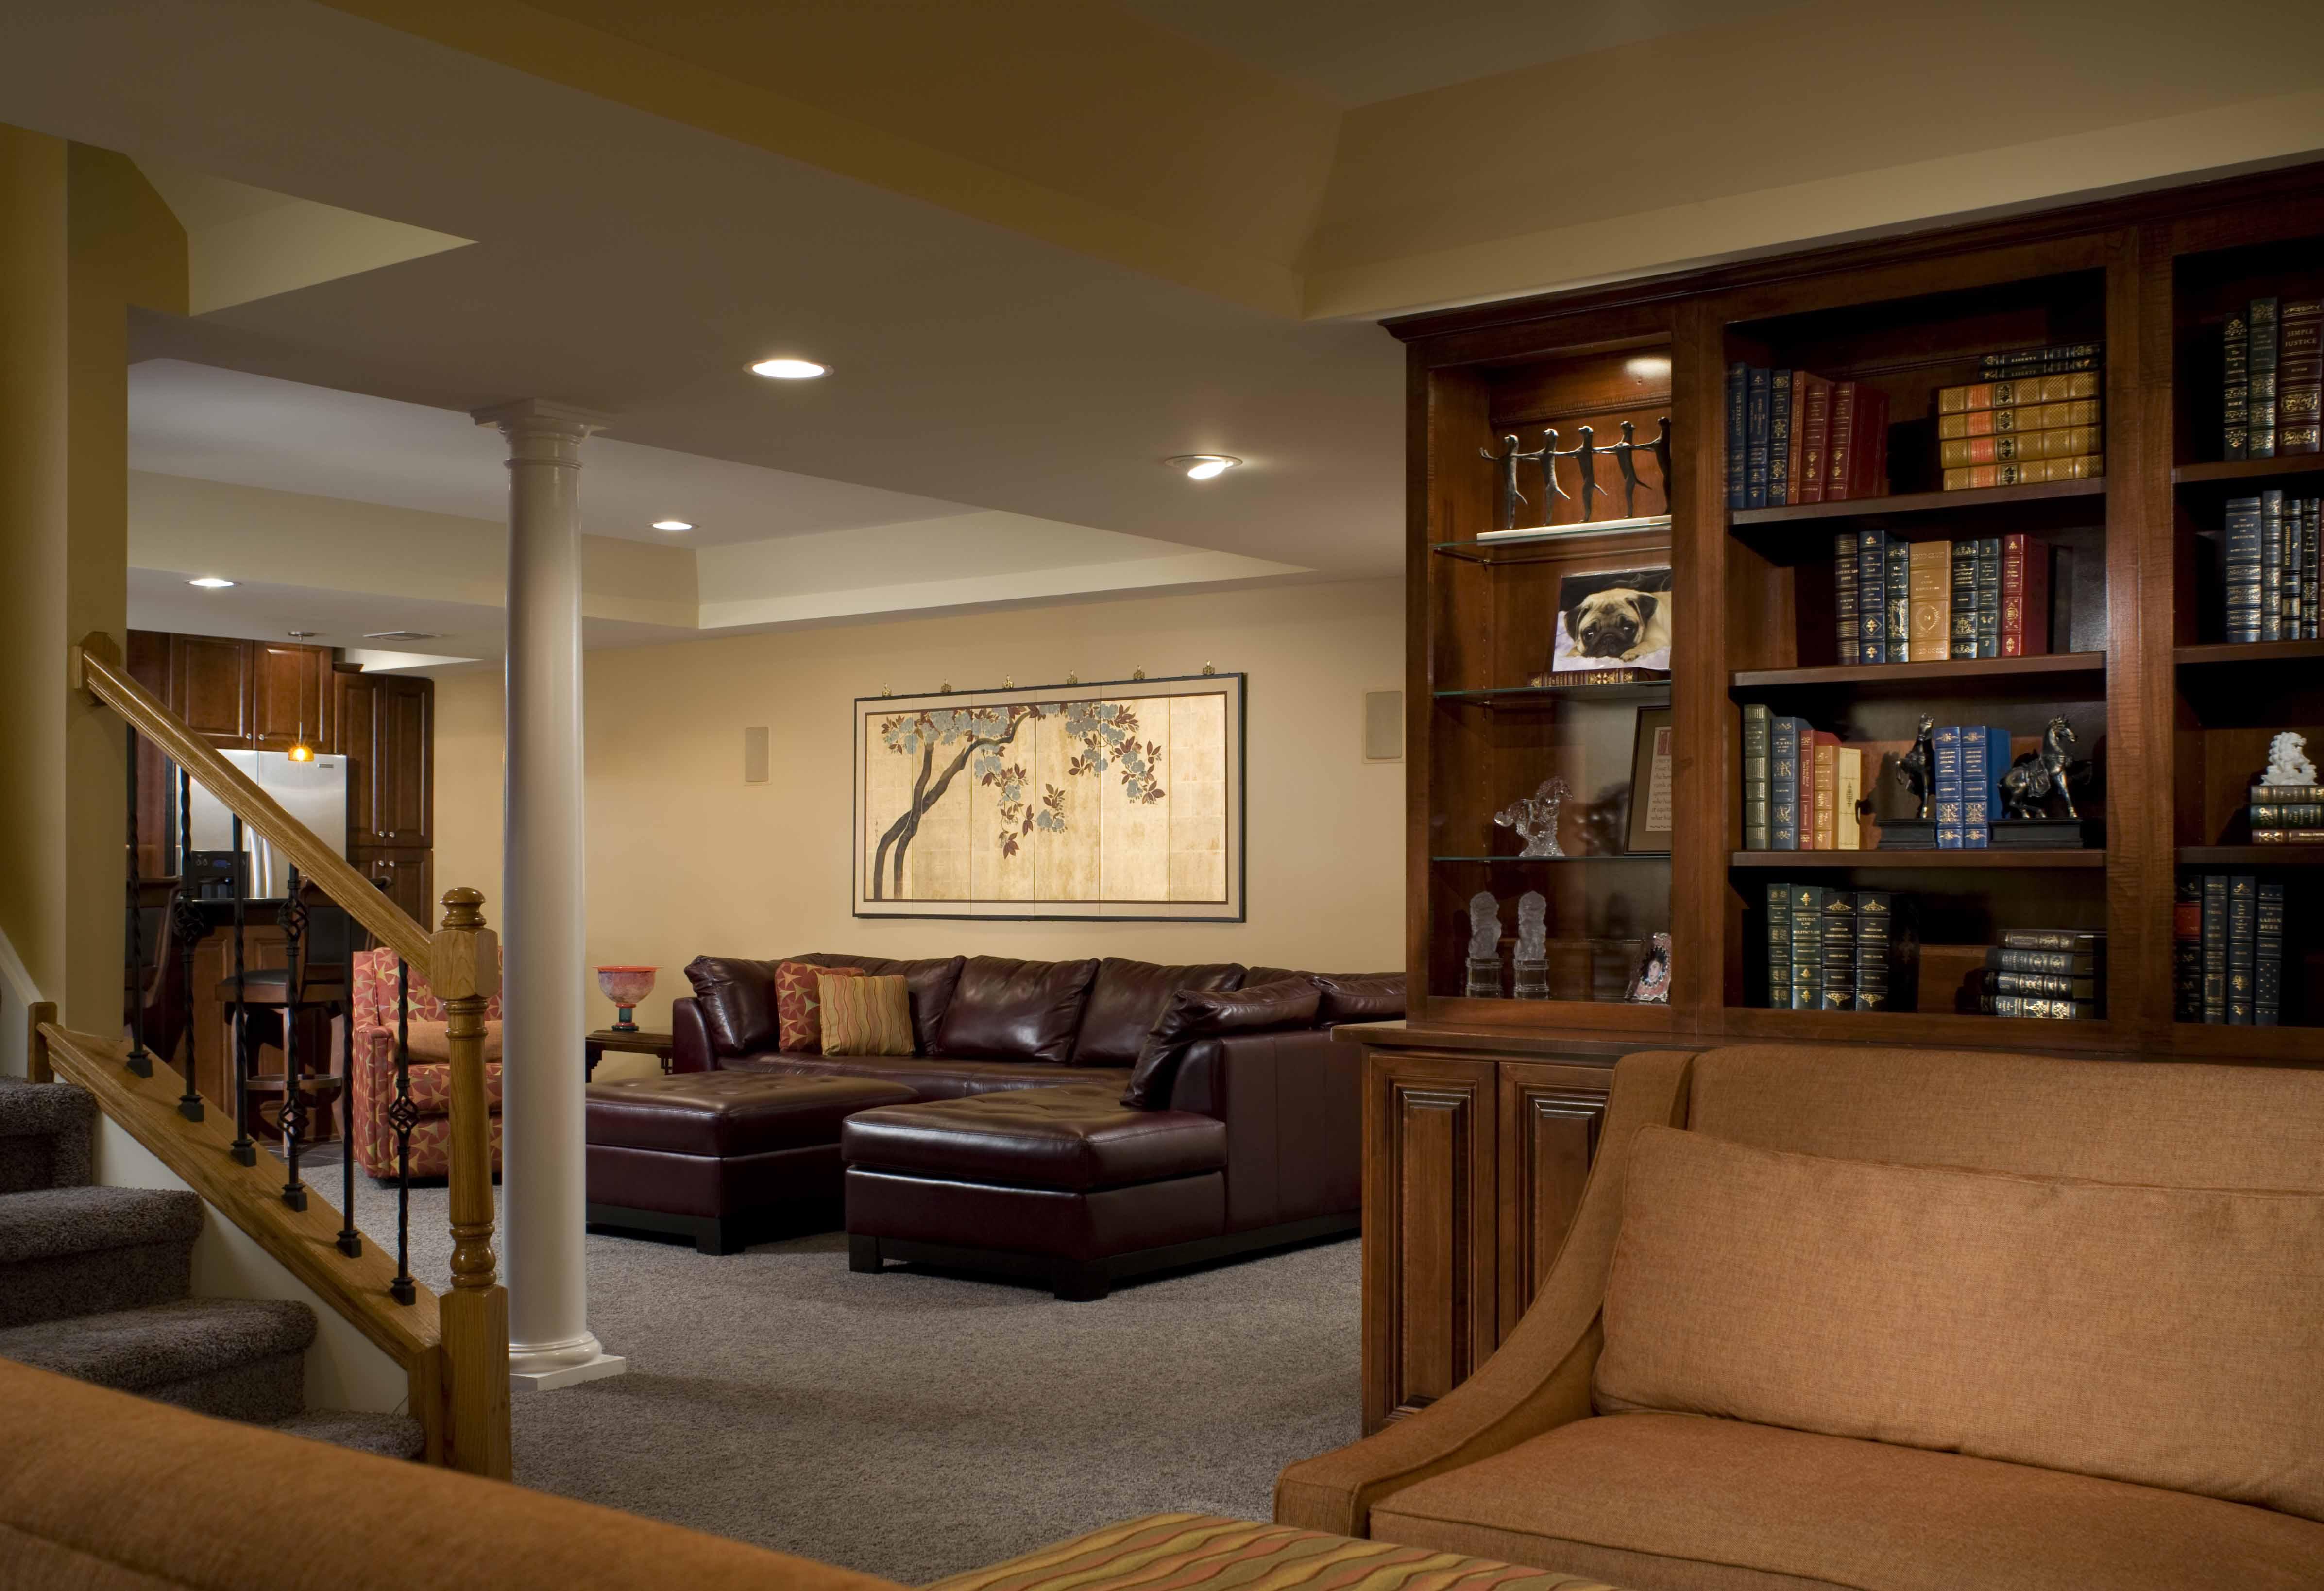 Amazing 30 Basement Remodeling Ideas u0026 Inspiration basement remodeling ideas